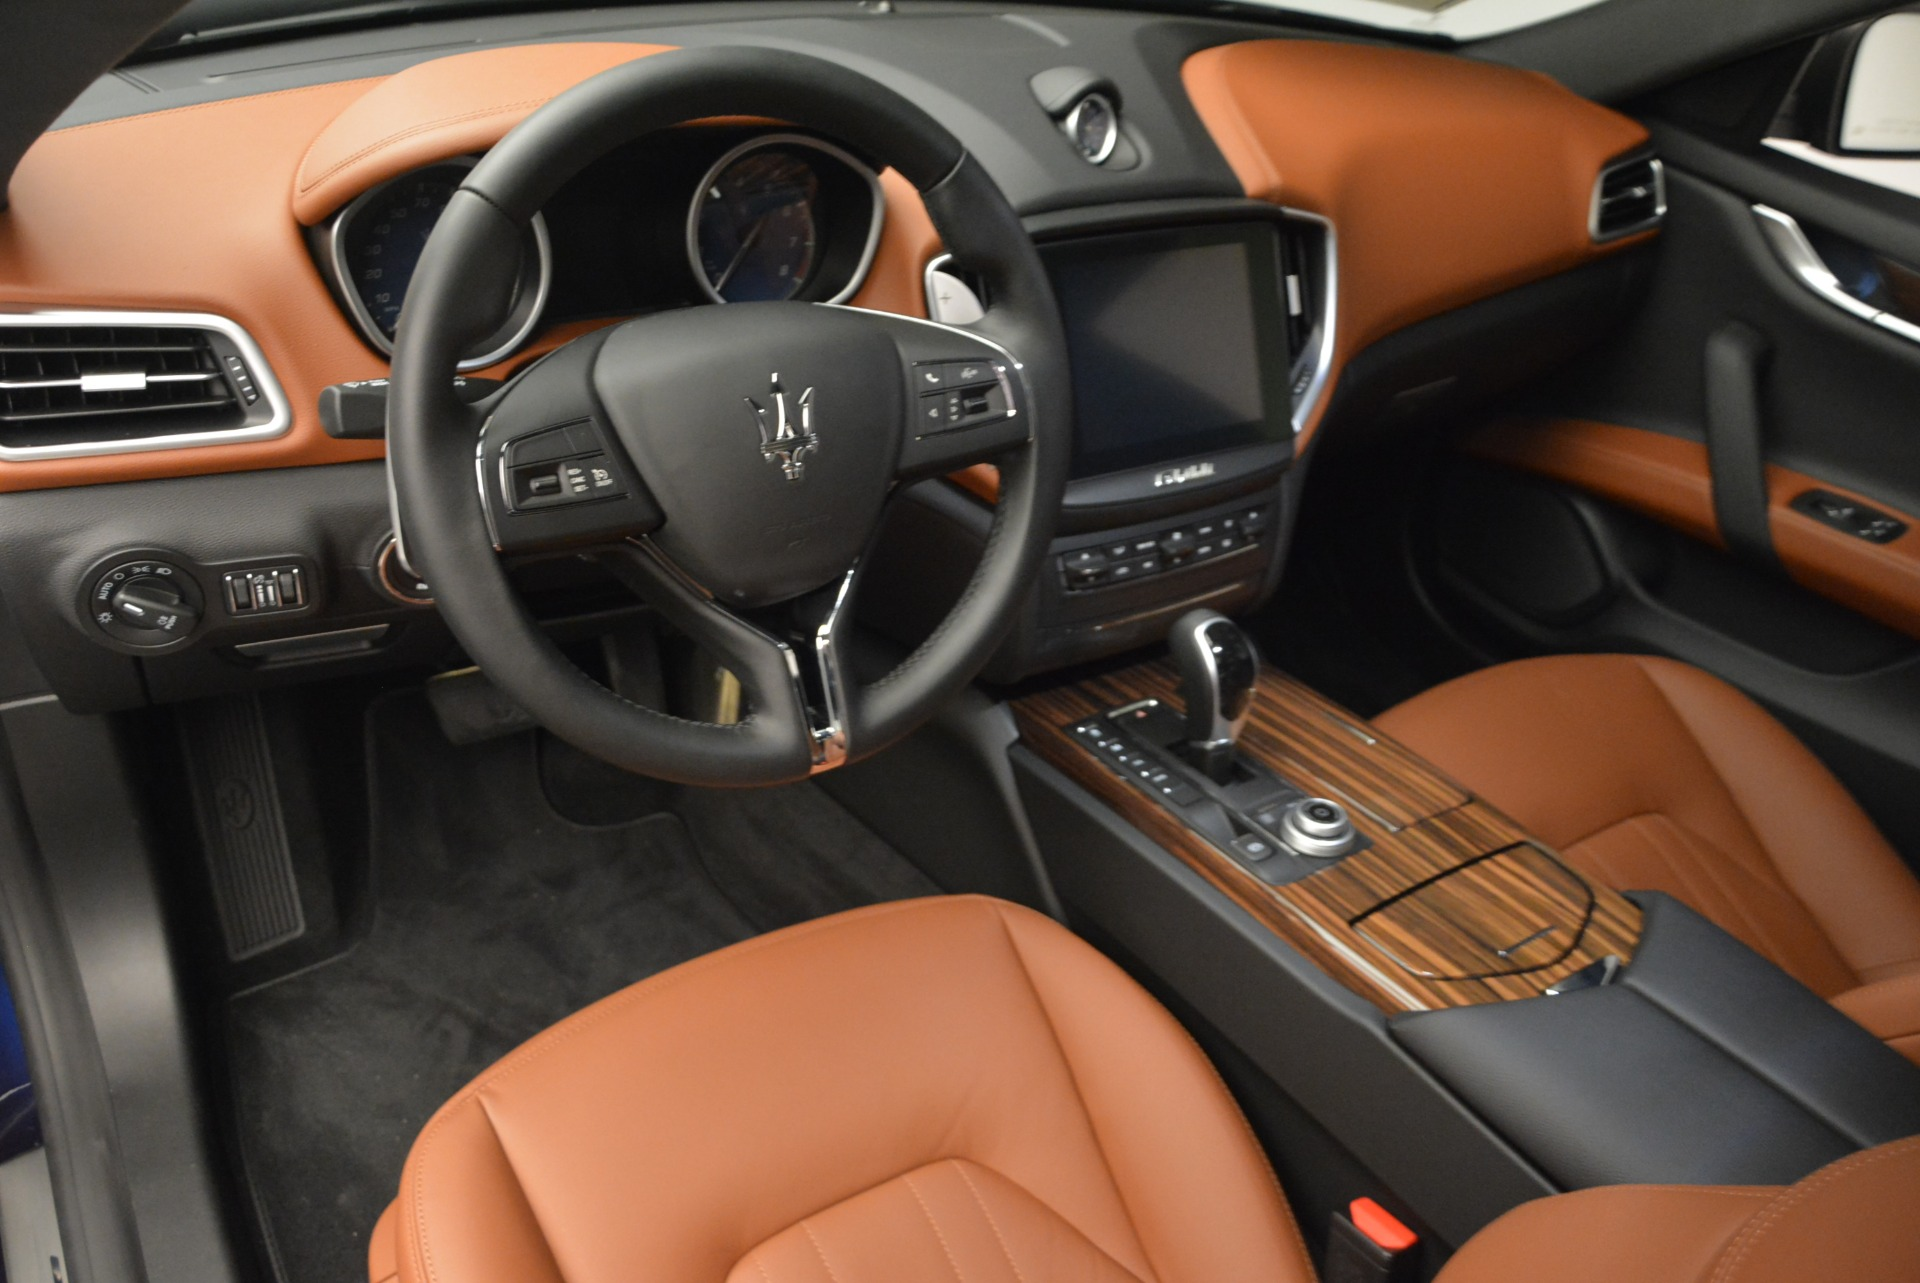 Used 2017 Maserati Ghibli S Q4 Ex-Loaner For Sale In Westport, CT 719_p16